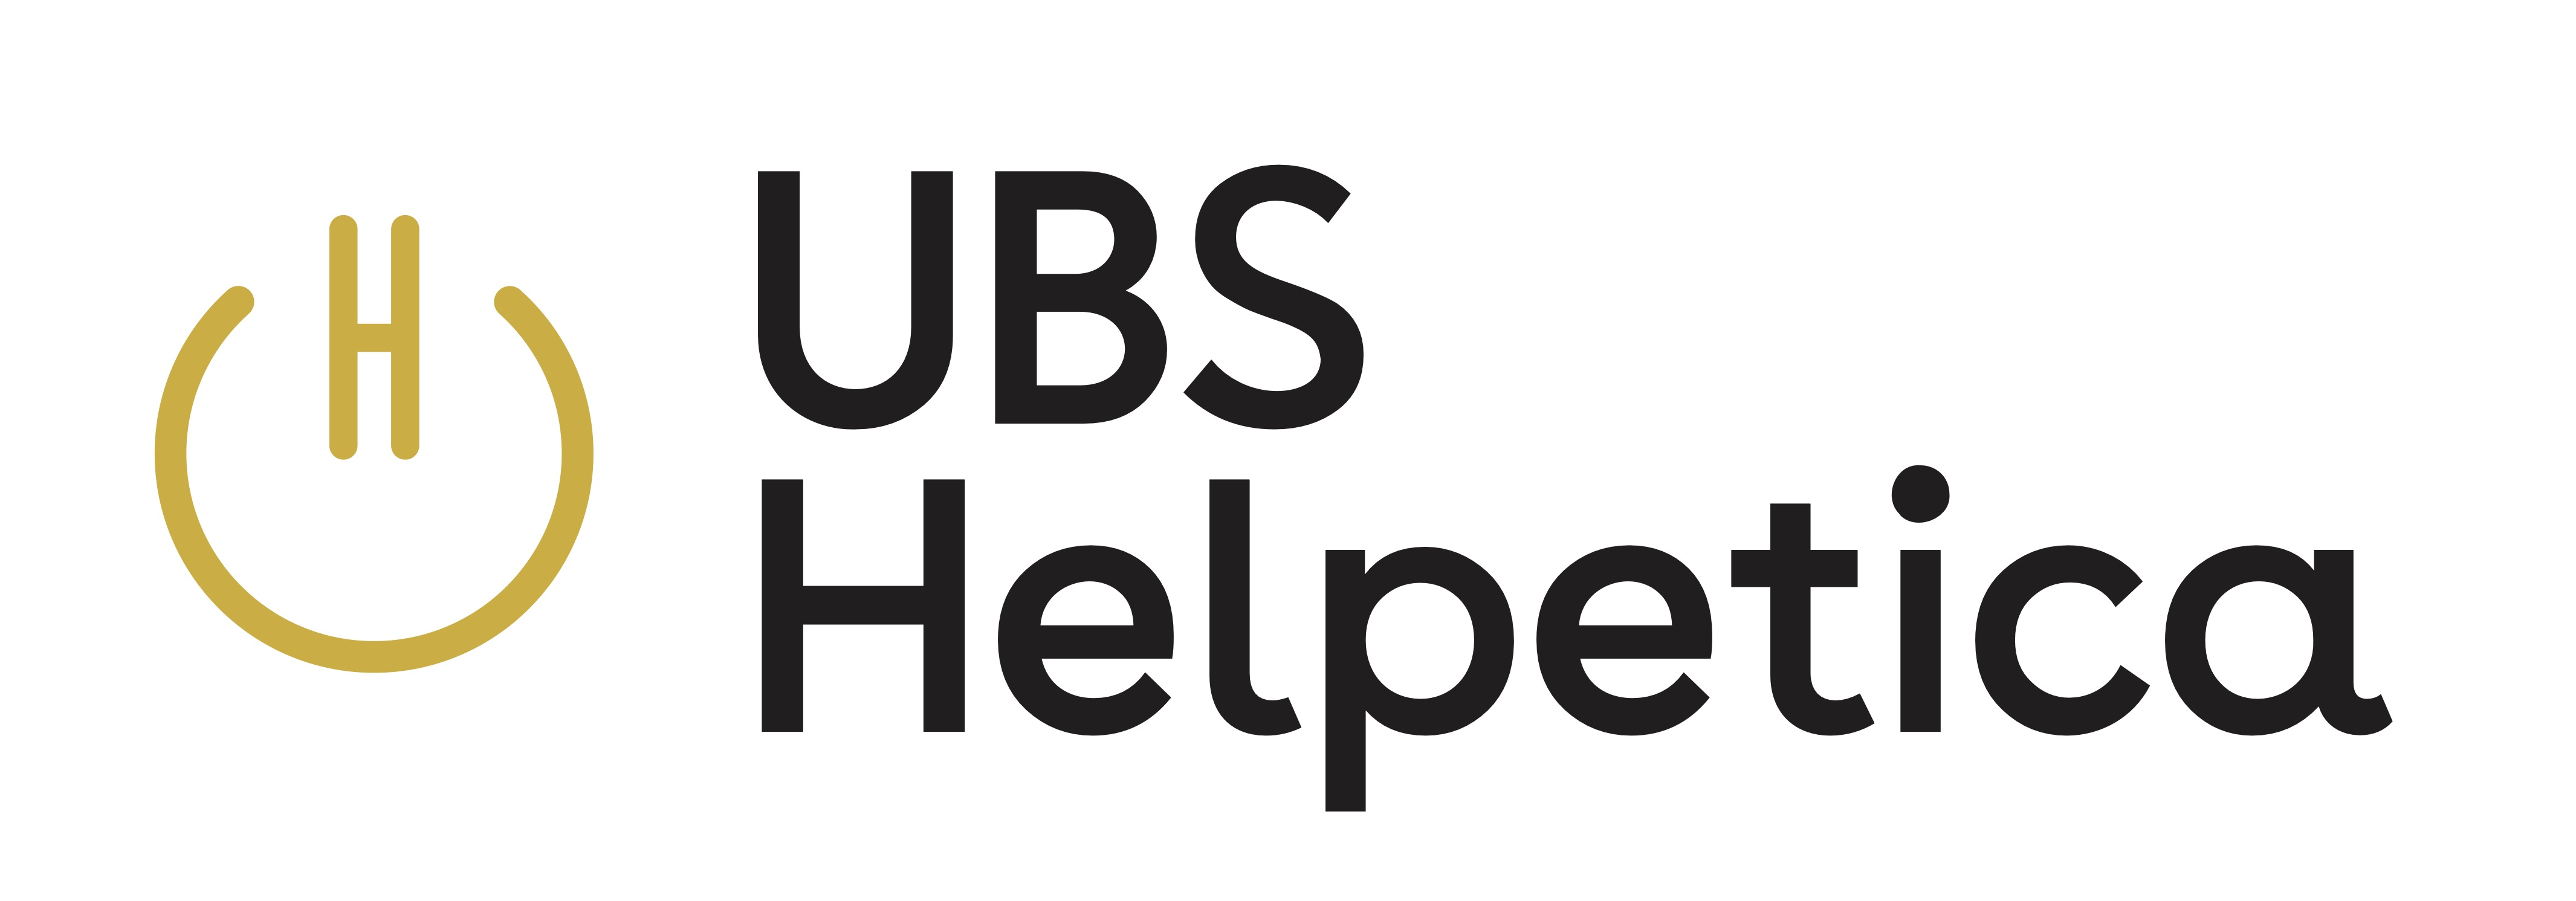 Helpetica_Logo_CMYK_1